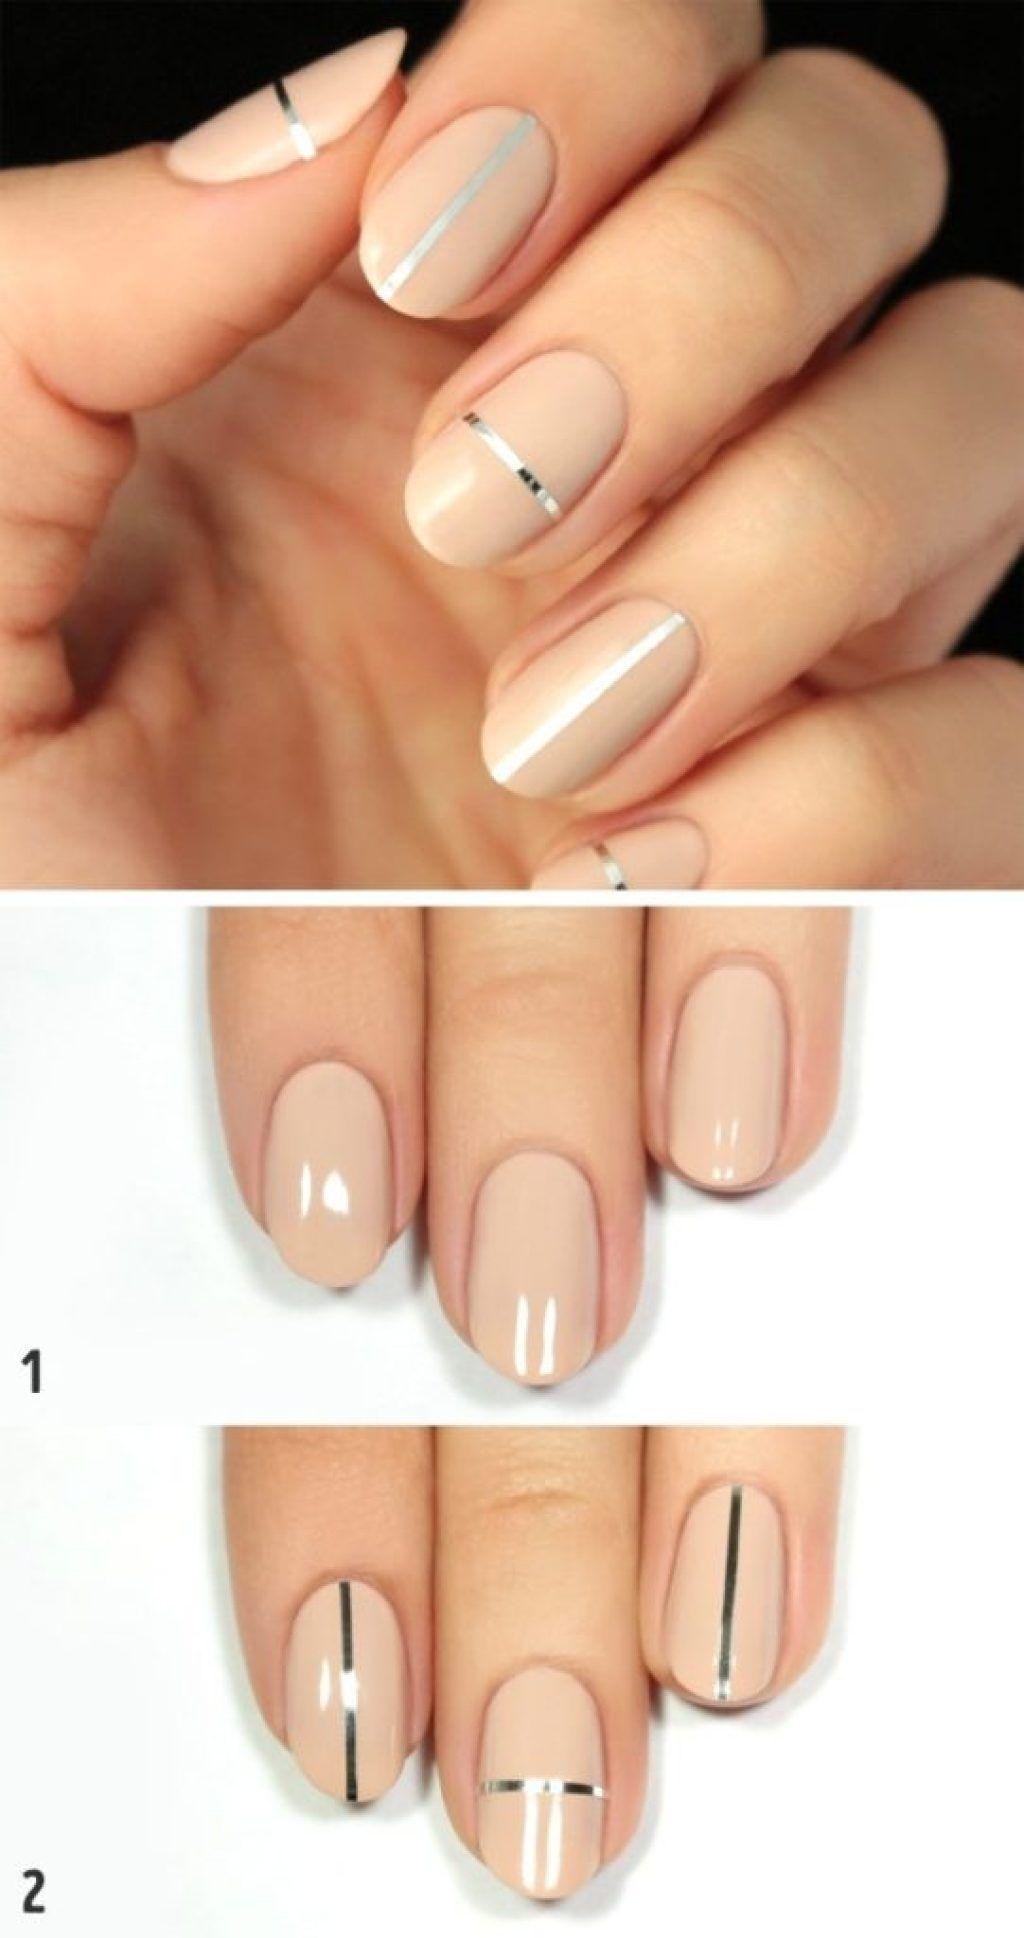 10 Perfektnich Zpusobu Jak Si Ozdobit Kratke I Dlouhe Nehty In 2020 Work Nails Perfect Nails Office Nails